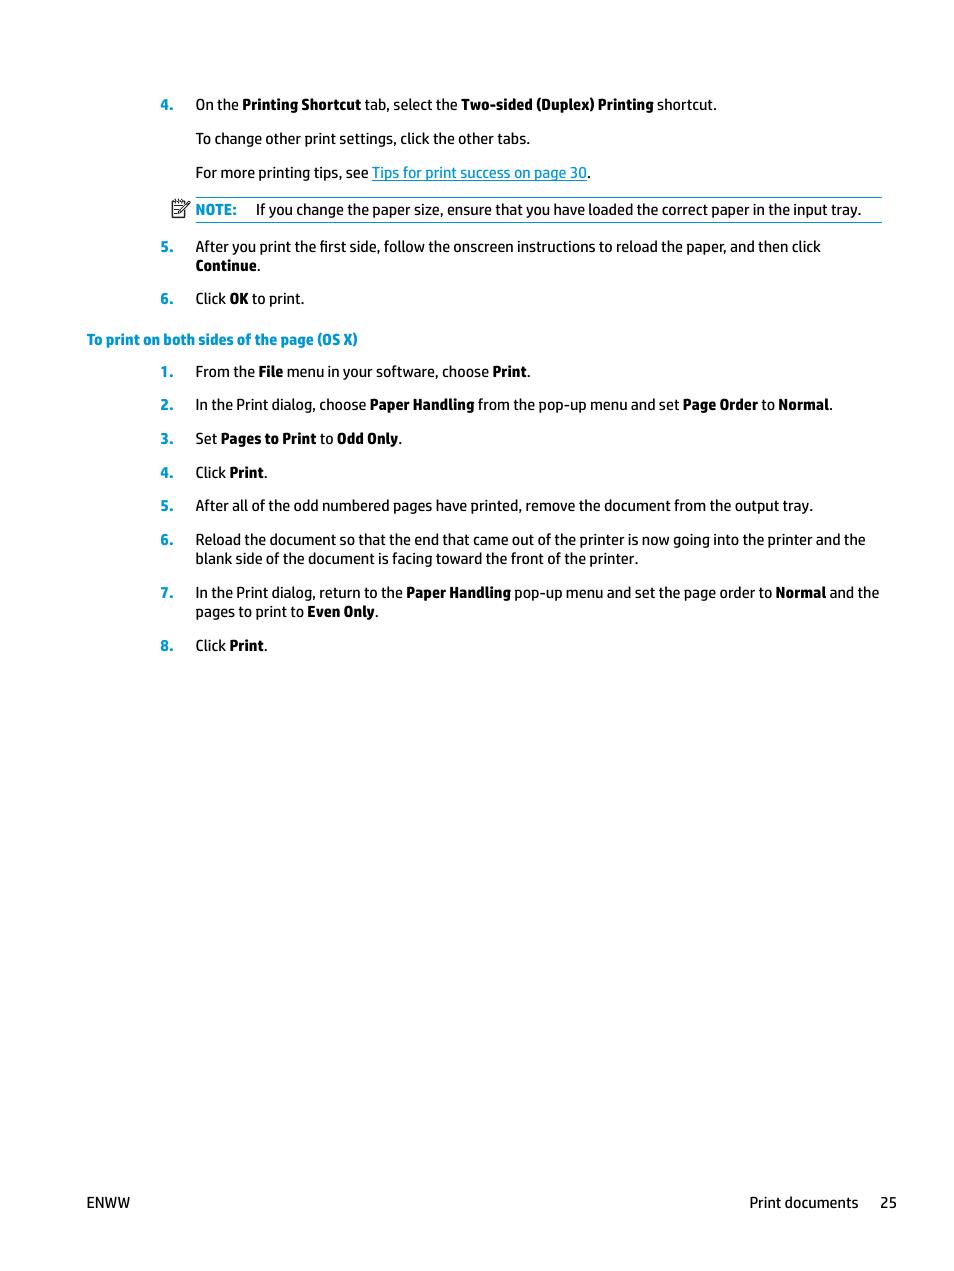 HP DeskJet 3700 User Manual | Page 29 / 118